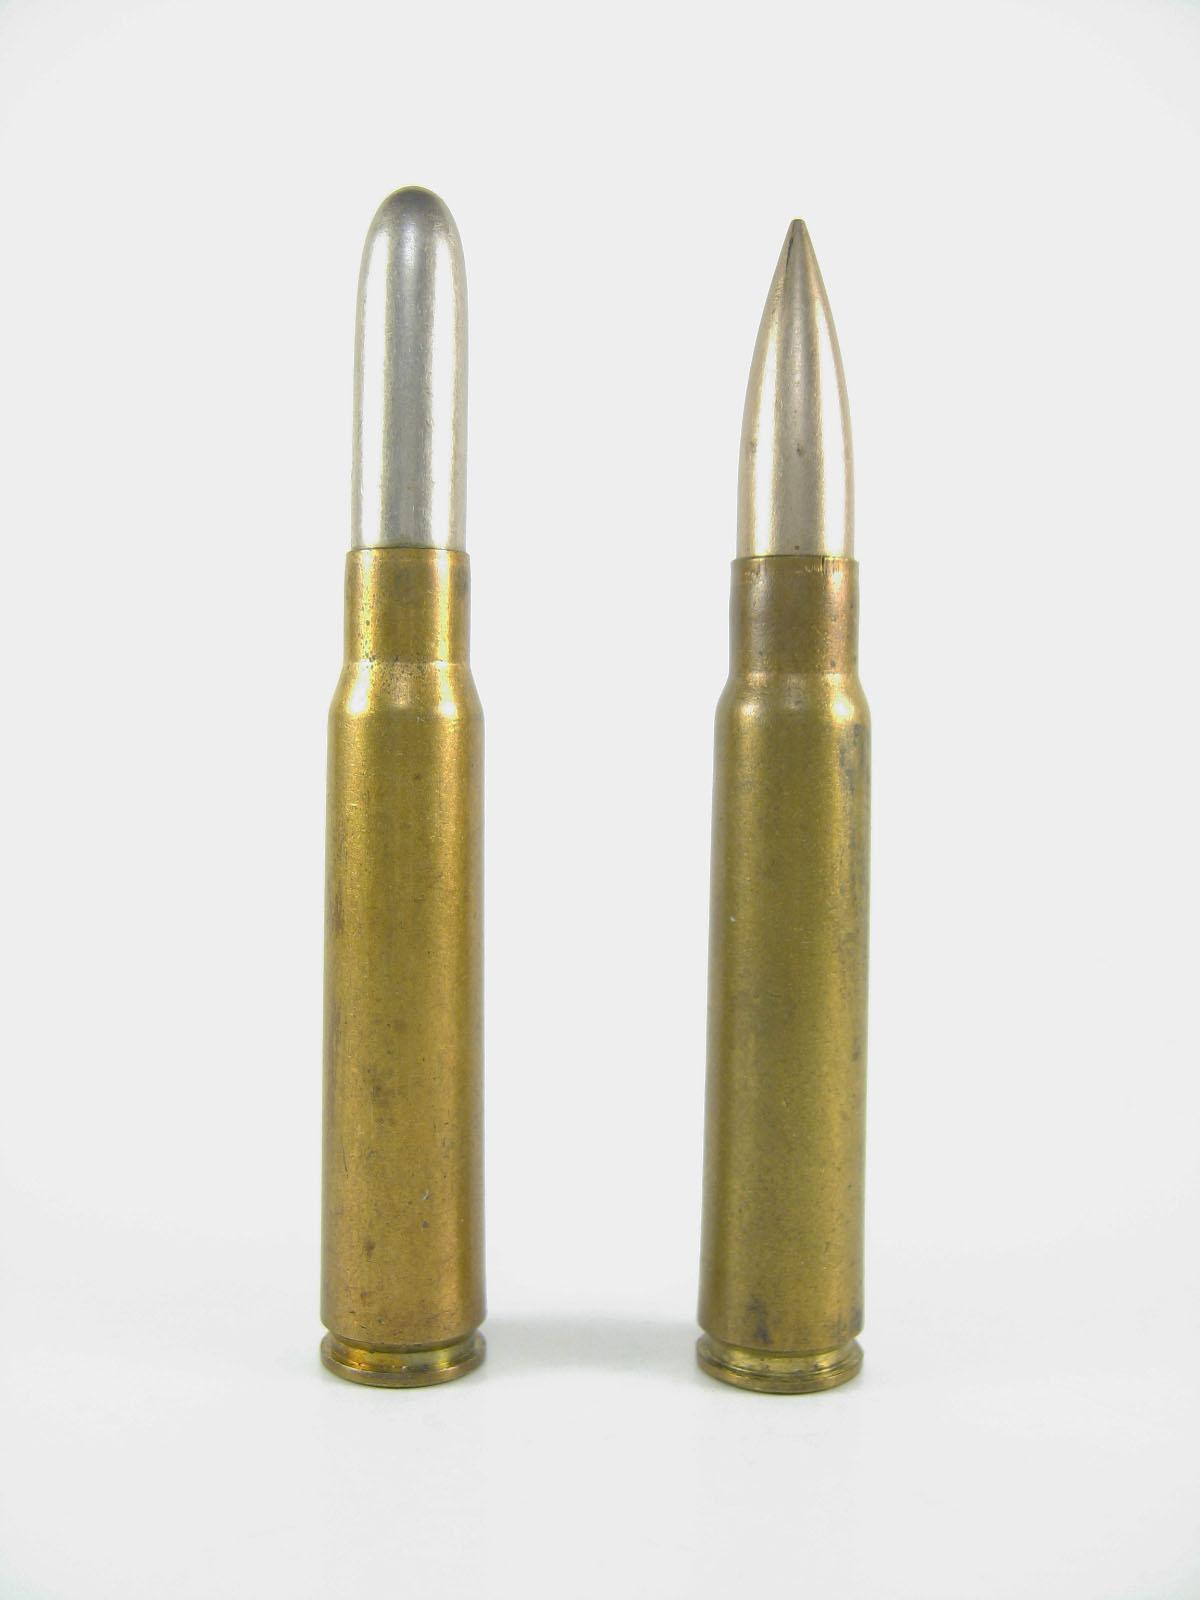 Spitzer (bullet) - Wikipedia